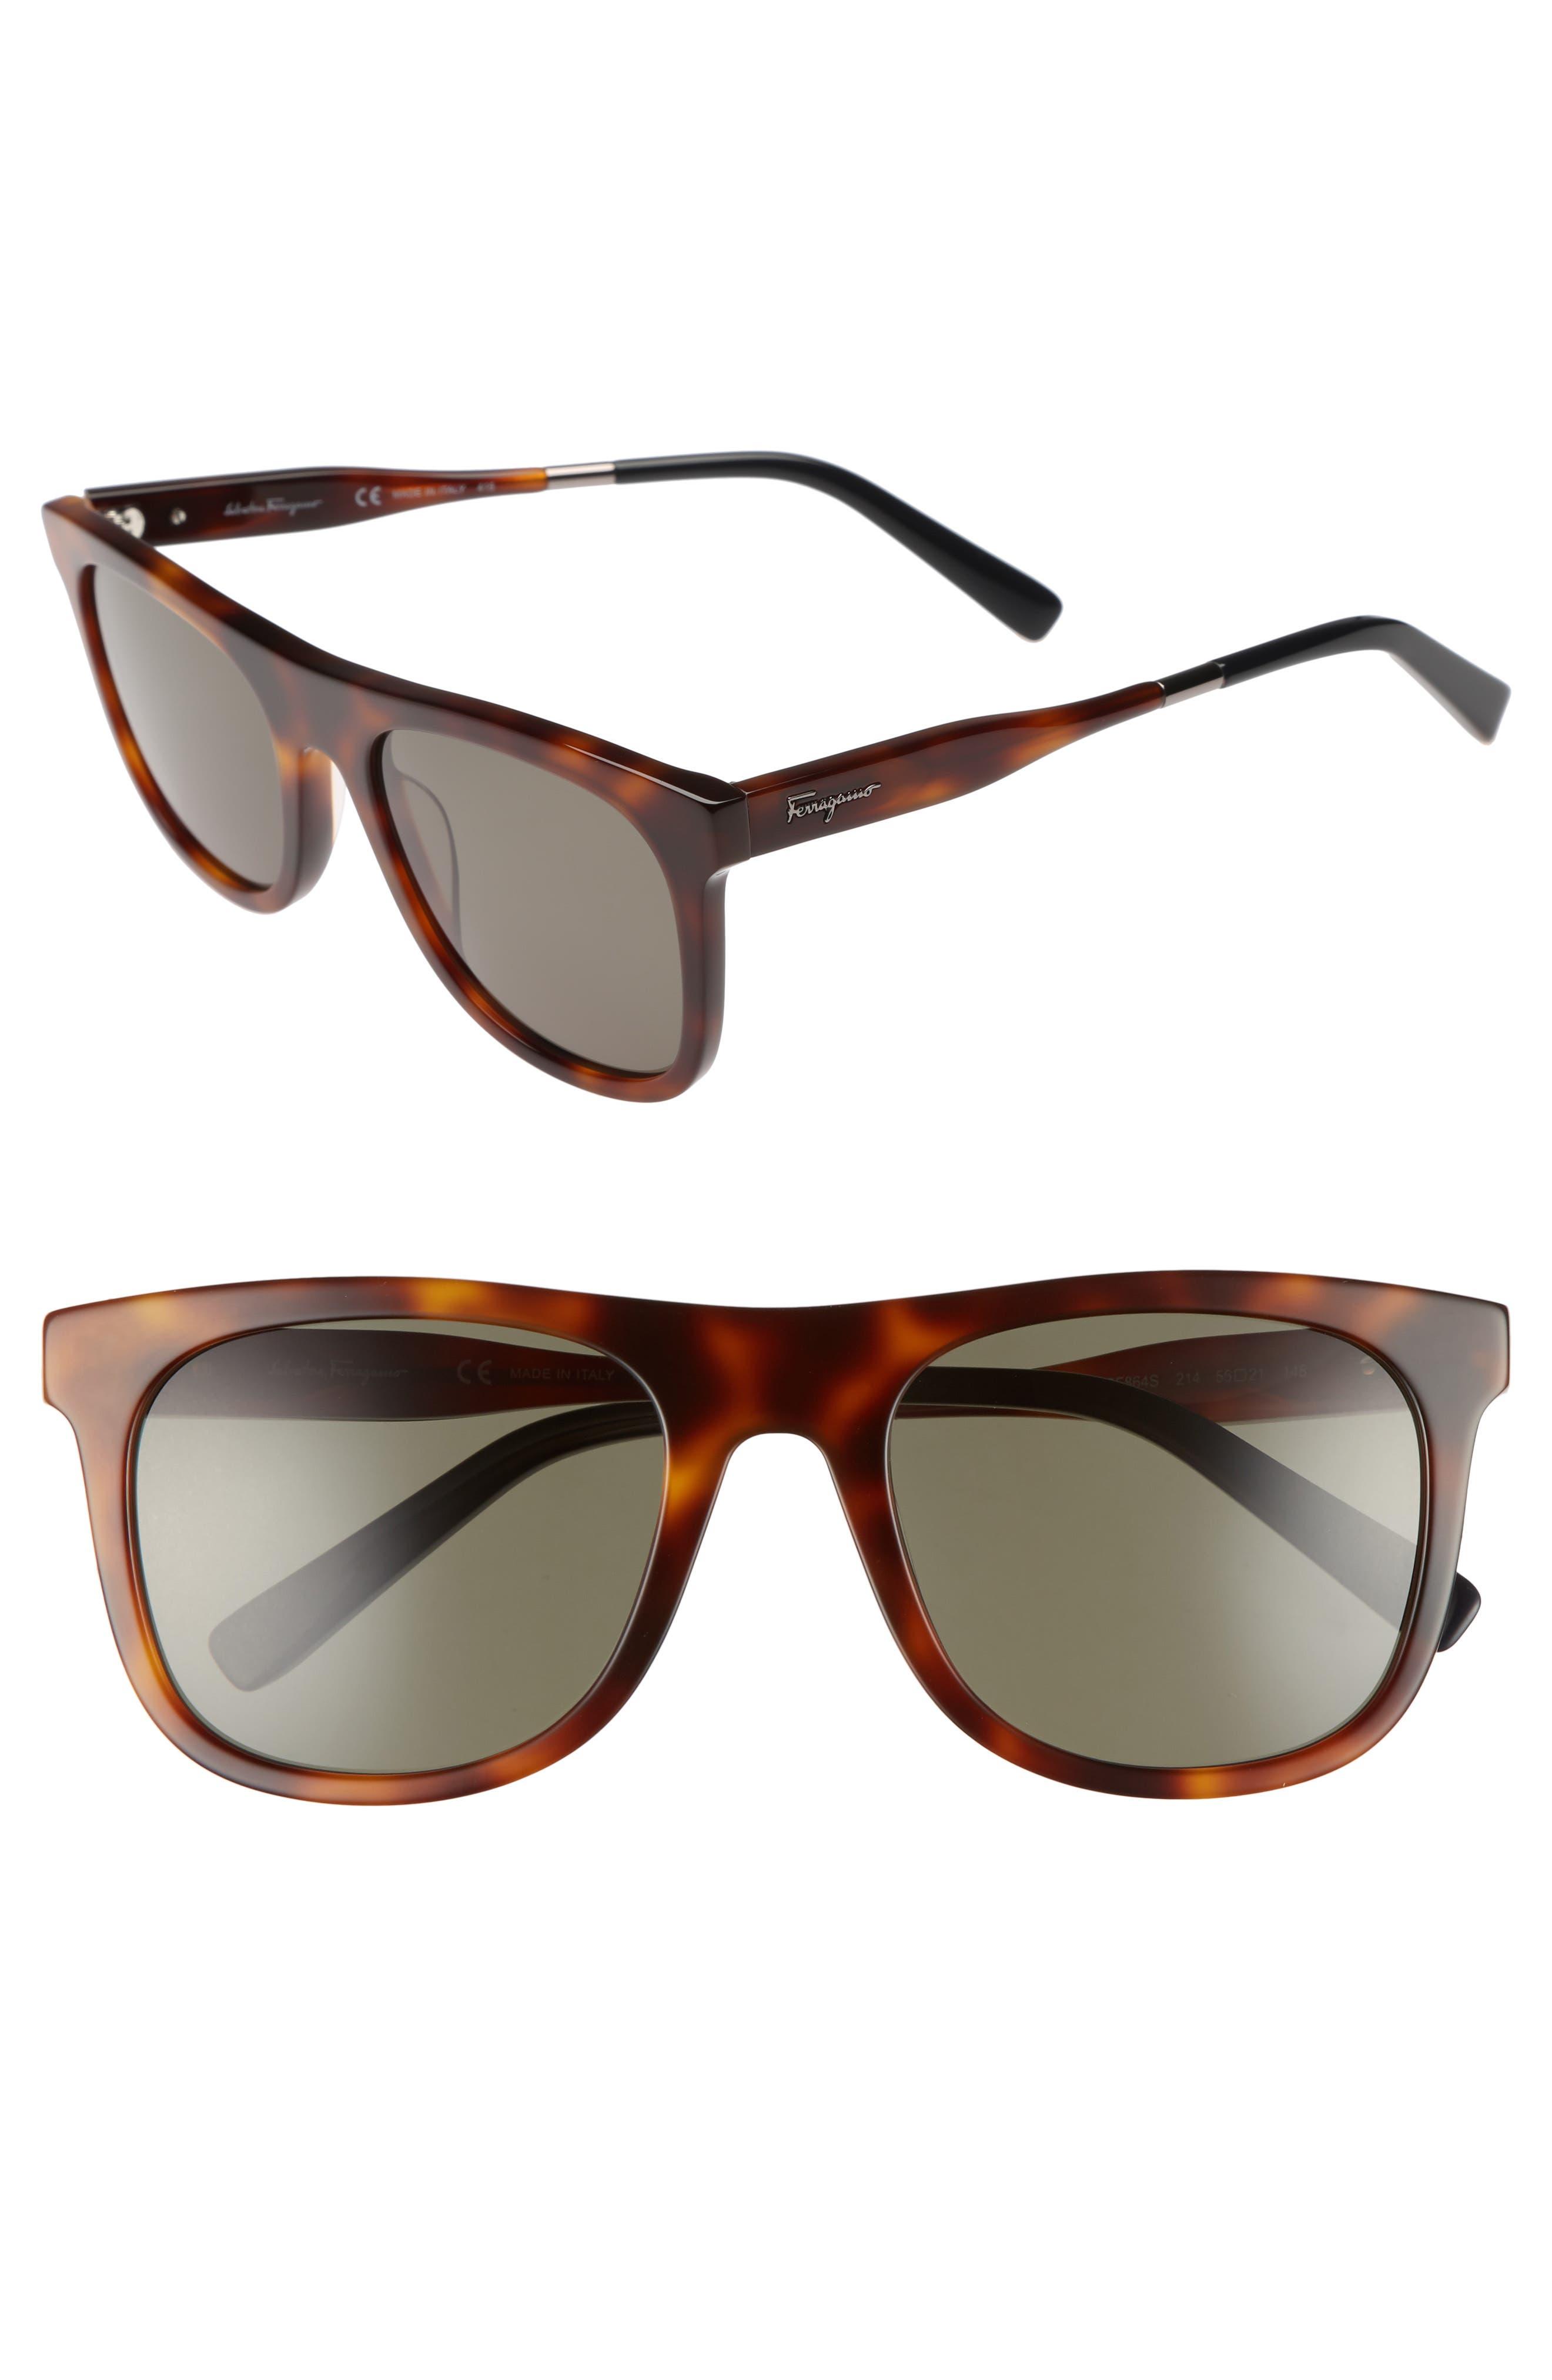 Main Image - Salvatore Ferragamo 55mm Sunglasses